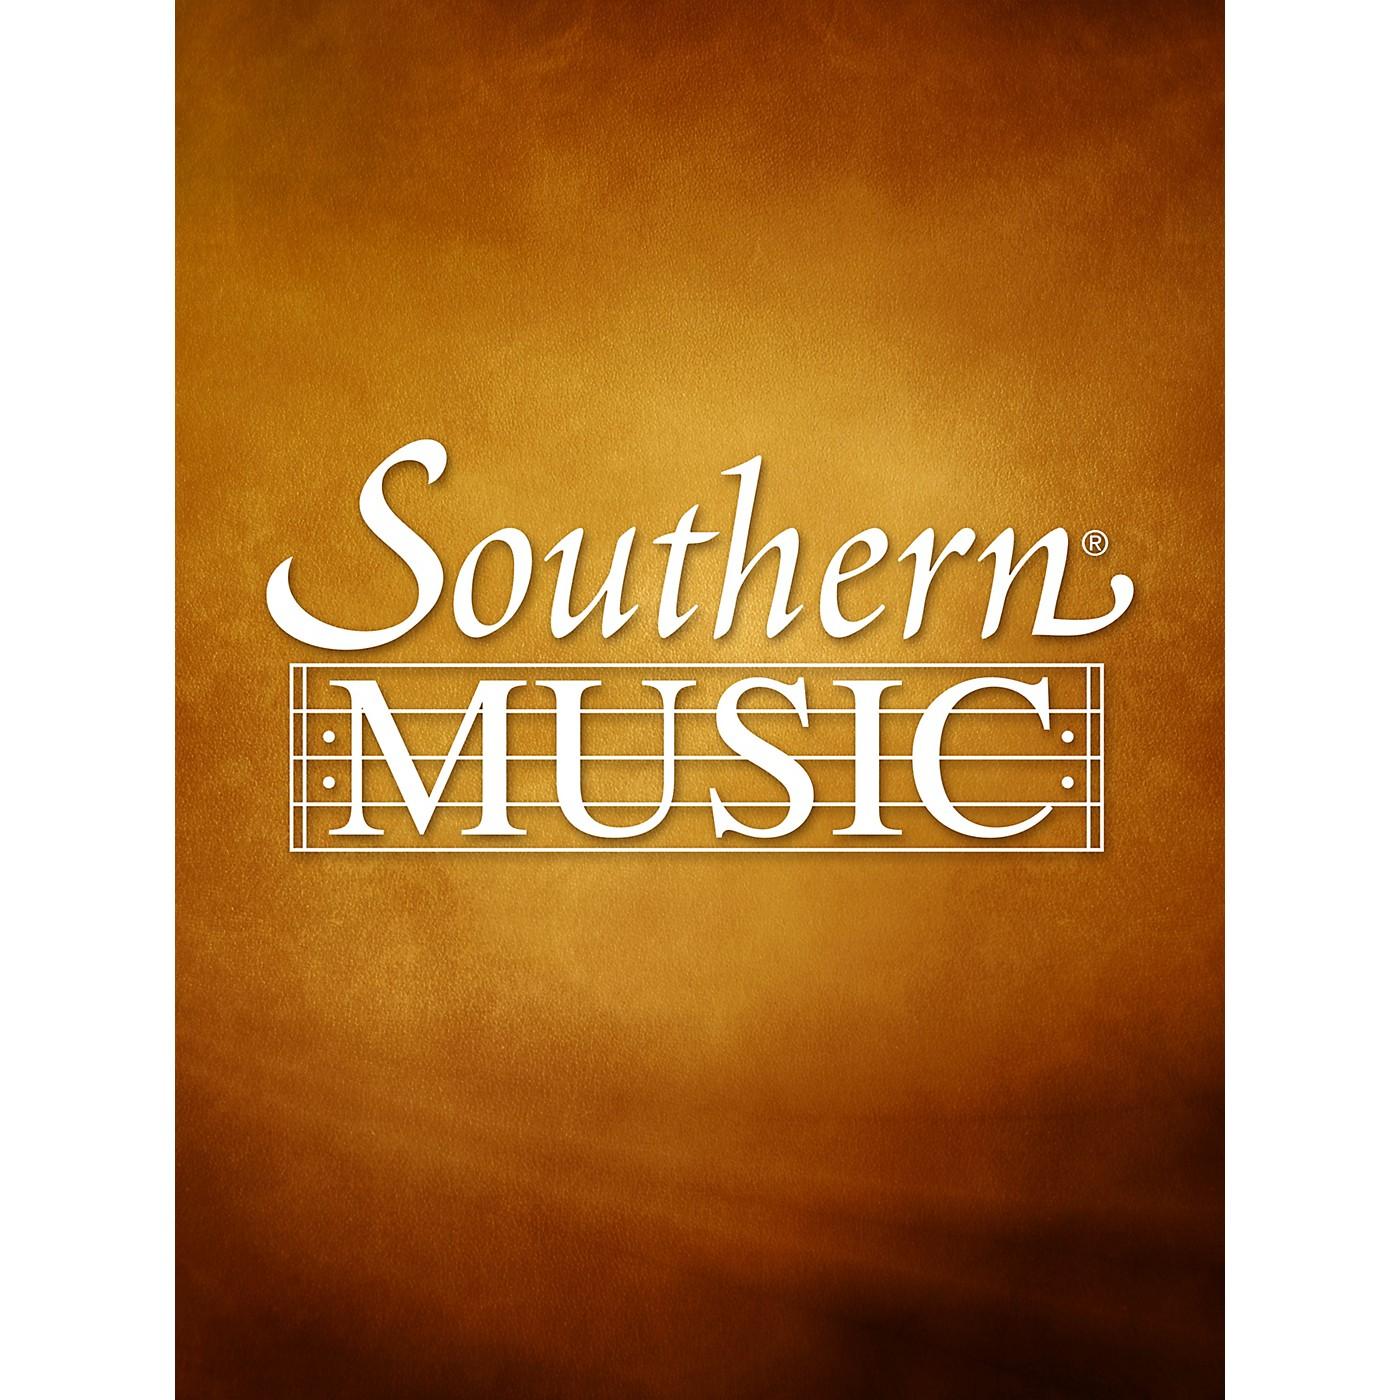 Southern Four Short Pieces (String Orchestra Music/String Orchestra) Southern Music Series Arranged by John Corina thumbnail